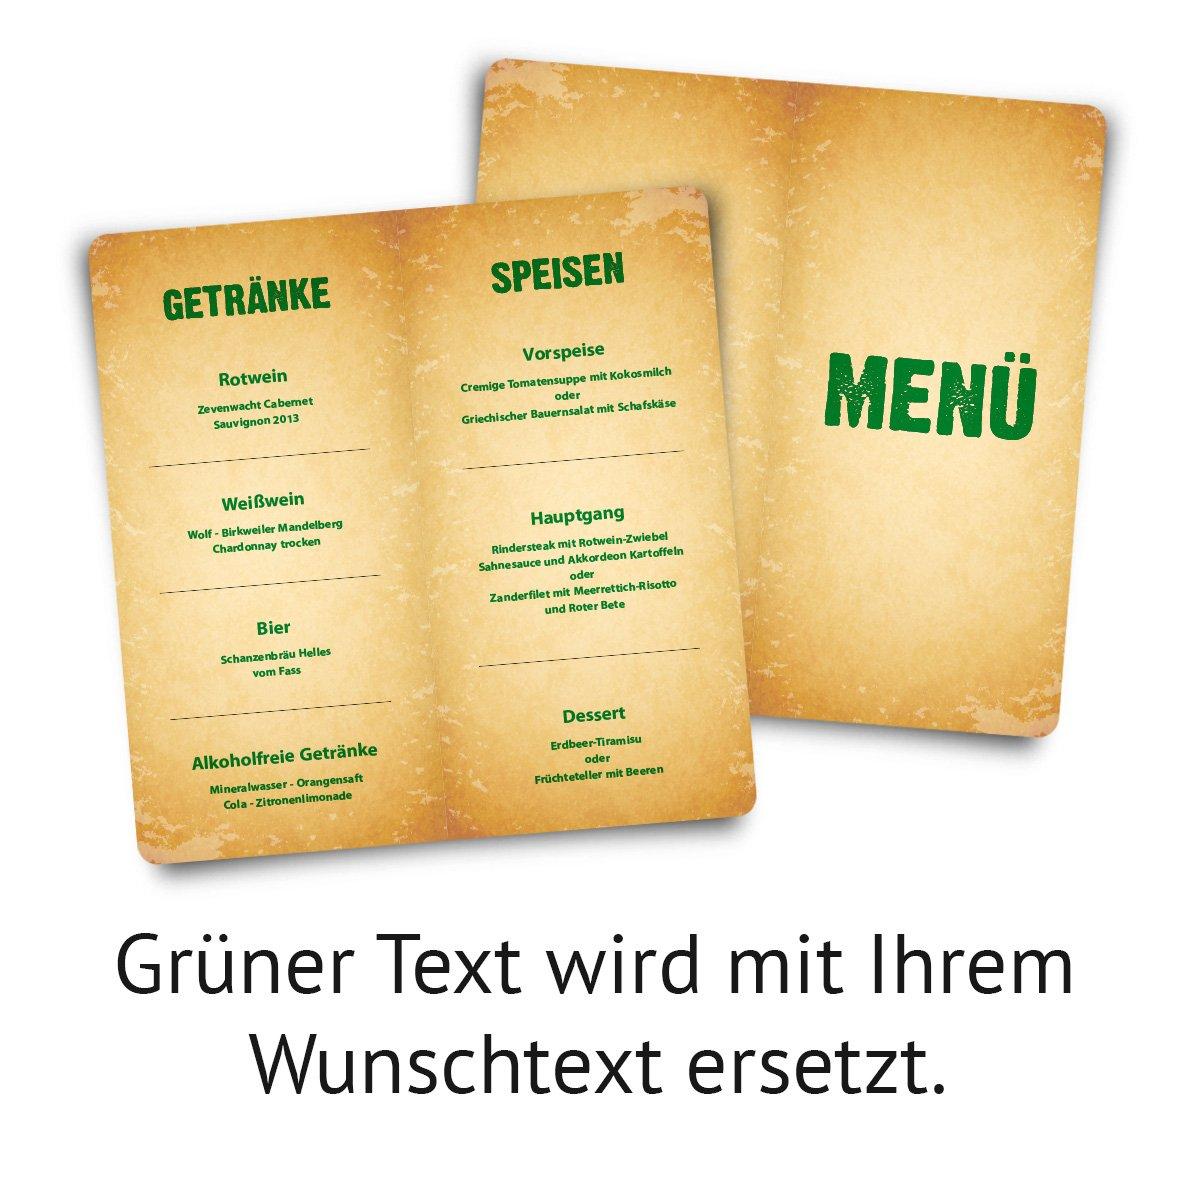 Menükarten Hochzeit (60 Stück) - Vintage - Speisekarte Speisekarte Speisekarte Getränkekarte B01N45QMO1   Bequeme Berührung    Sehr gute Farbe    Roman  68593e